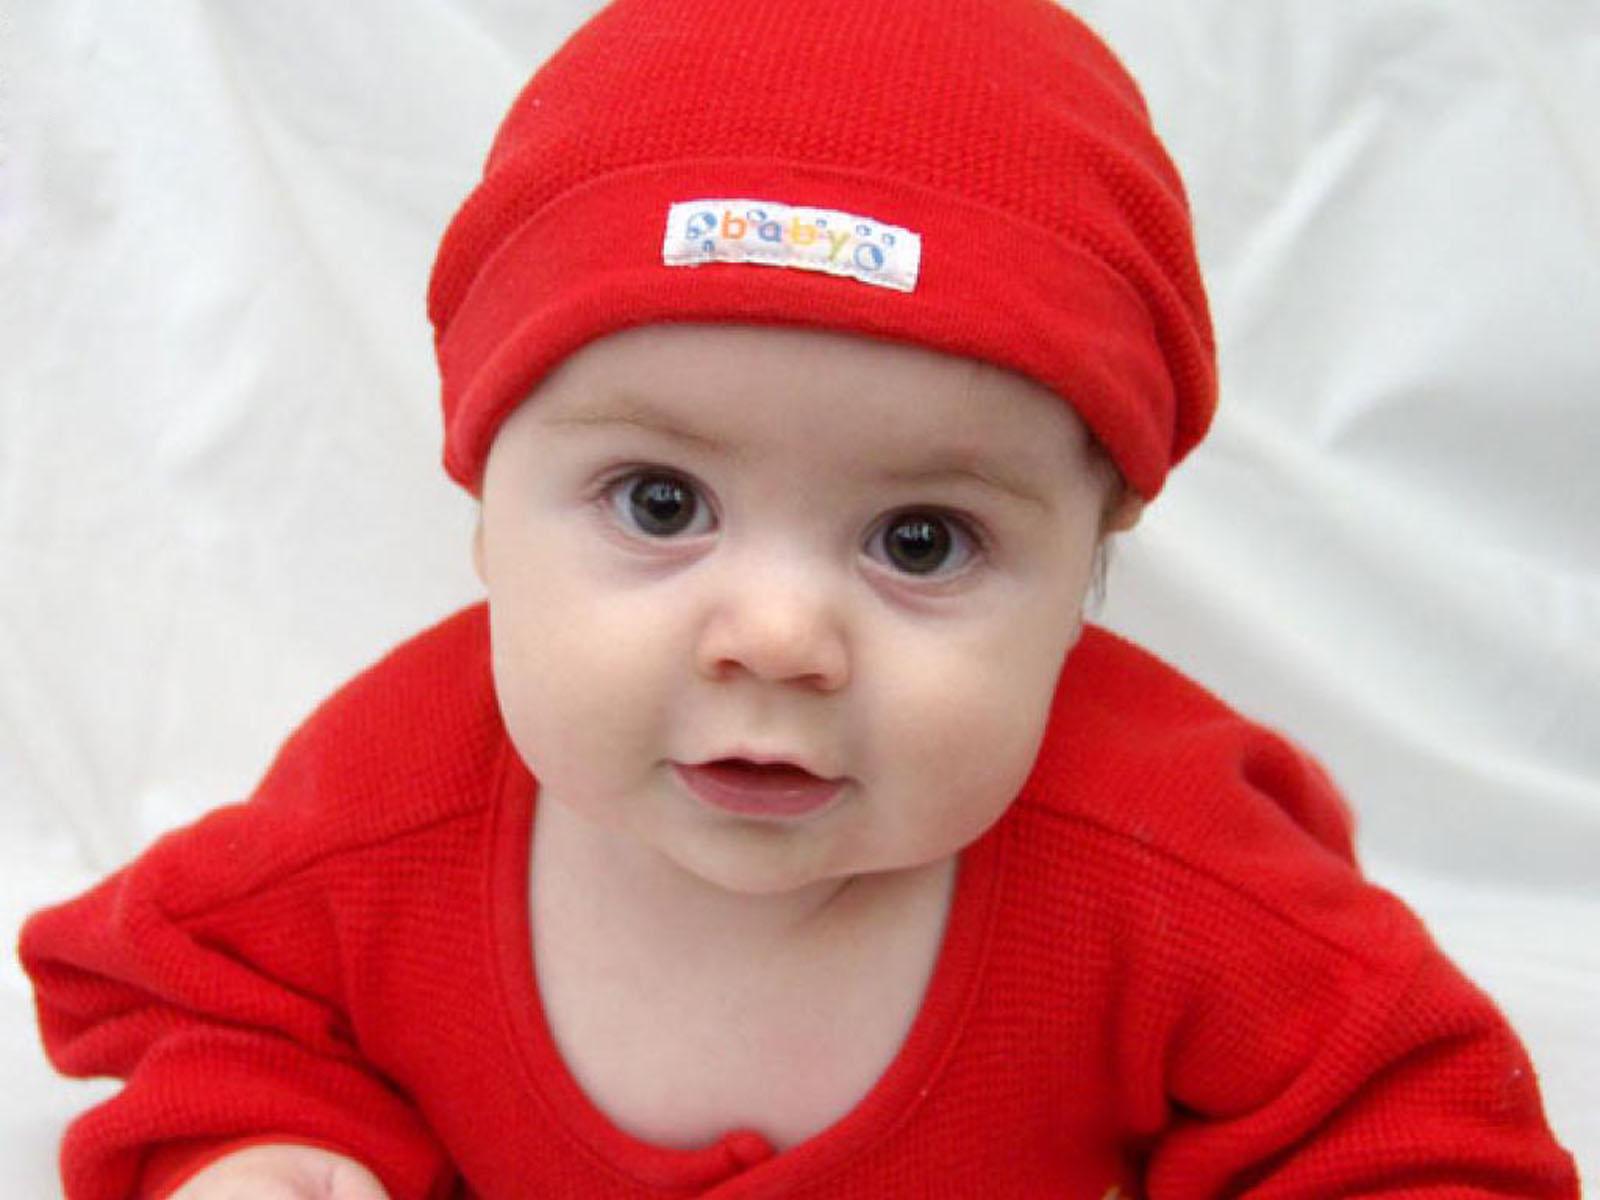 http://1.bp.blogspot.com/-U6Qp2Cvu8tQ/T12jUFvSyNI/AAAAAAAAA_4/L2oLEx2Txs8/s1600/Cute+Babies+Wallpapers+1.jpg